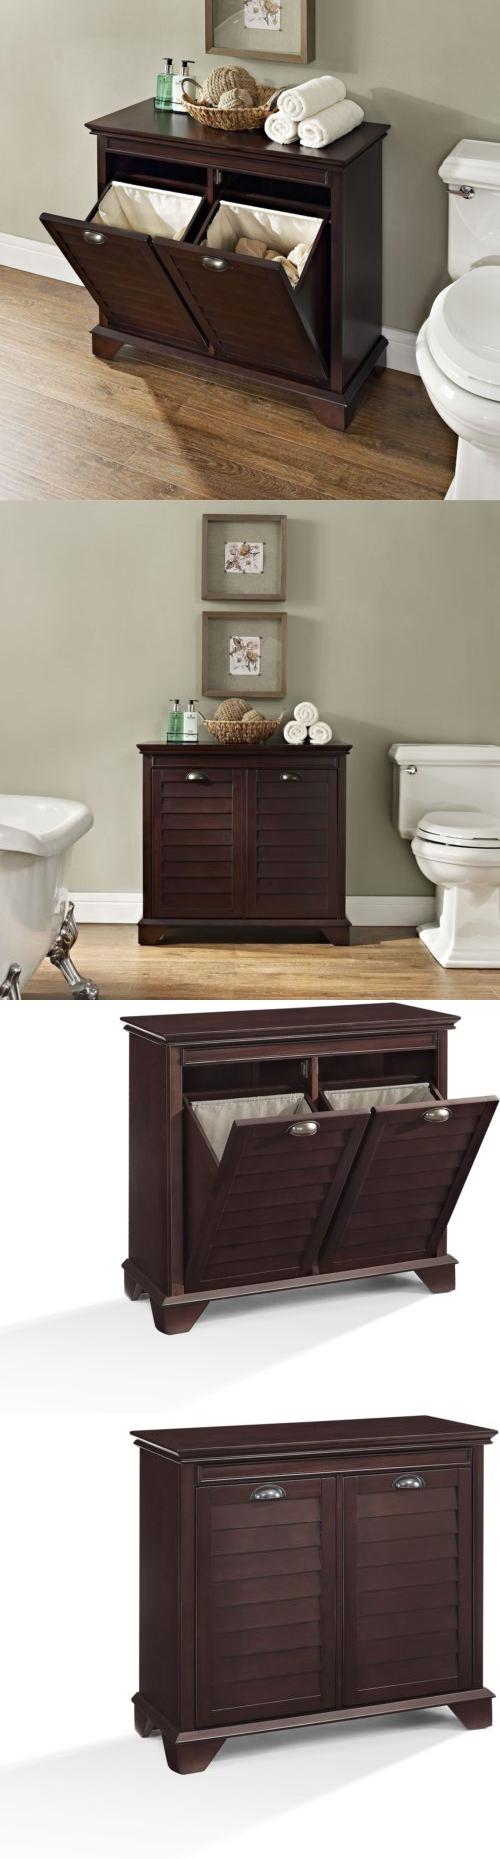 cabinet combo wood hamper out laundry tilt